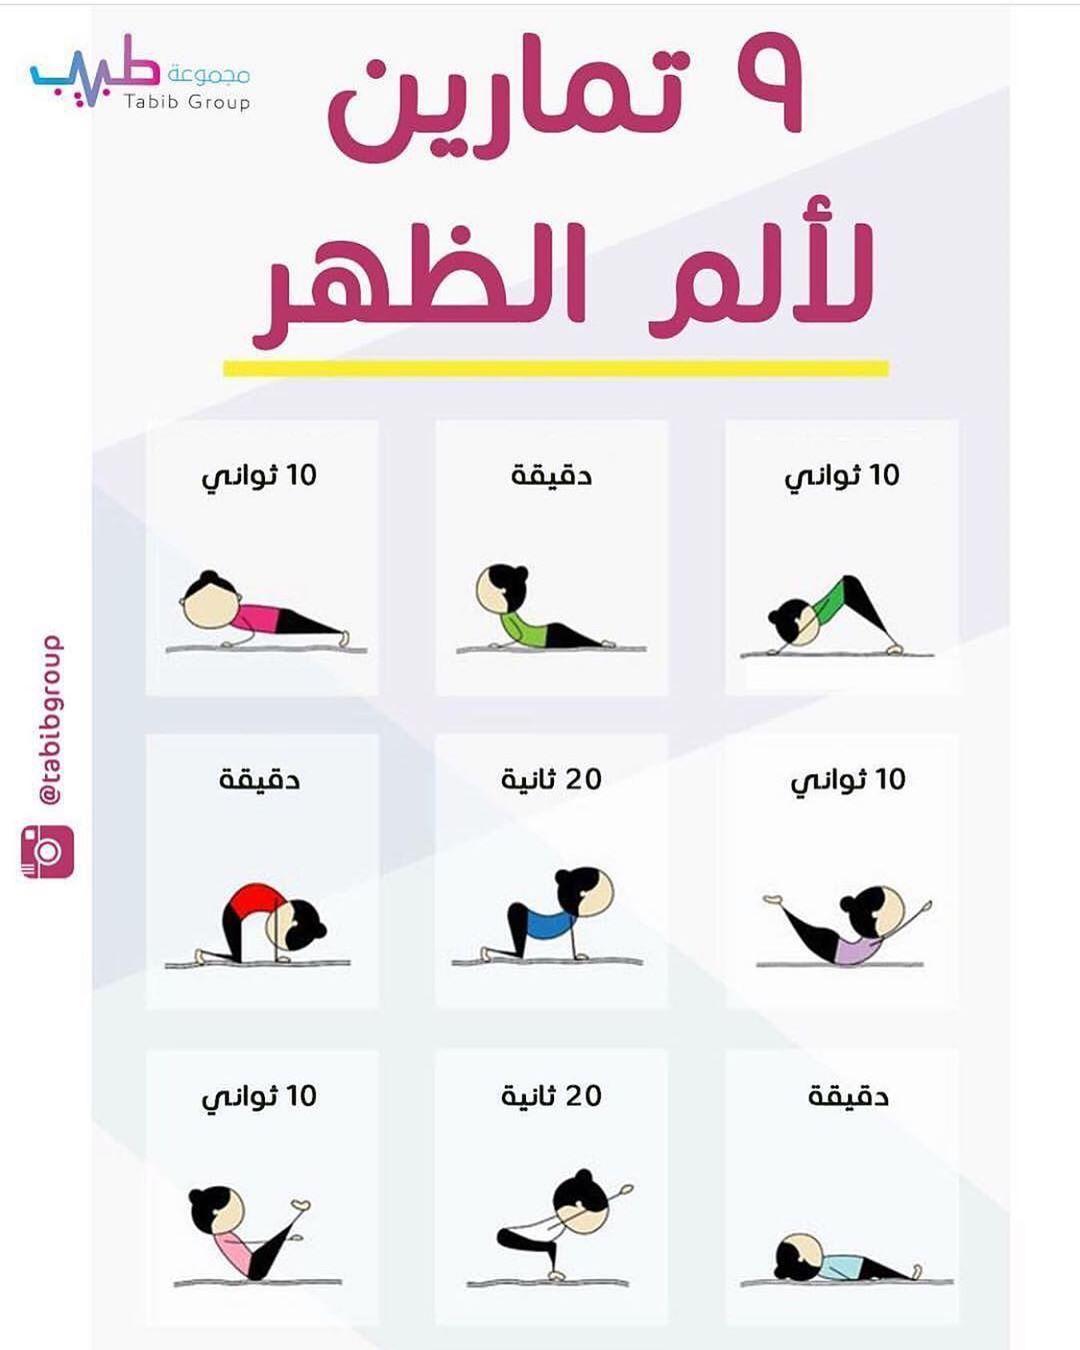 مجموعة طبيب Tabibgroup On Instagram Tabibgroup منشن وإن شاء الله تعم الفائدة ر Health Facts Fitness Health And Fitness Expo Gym Workout For Beginners